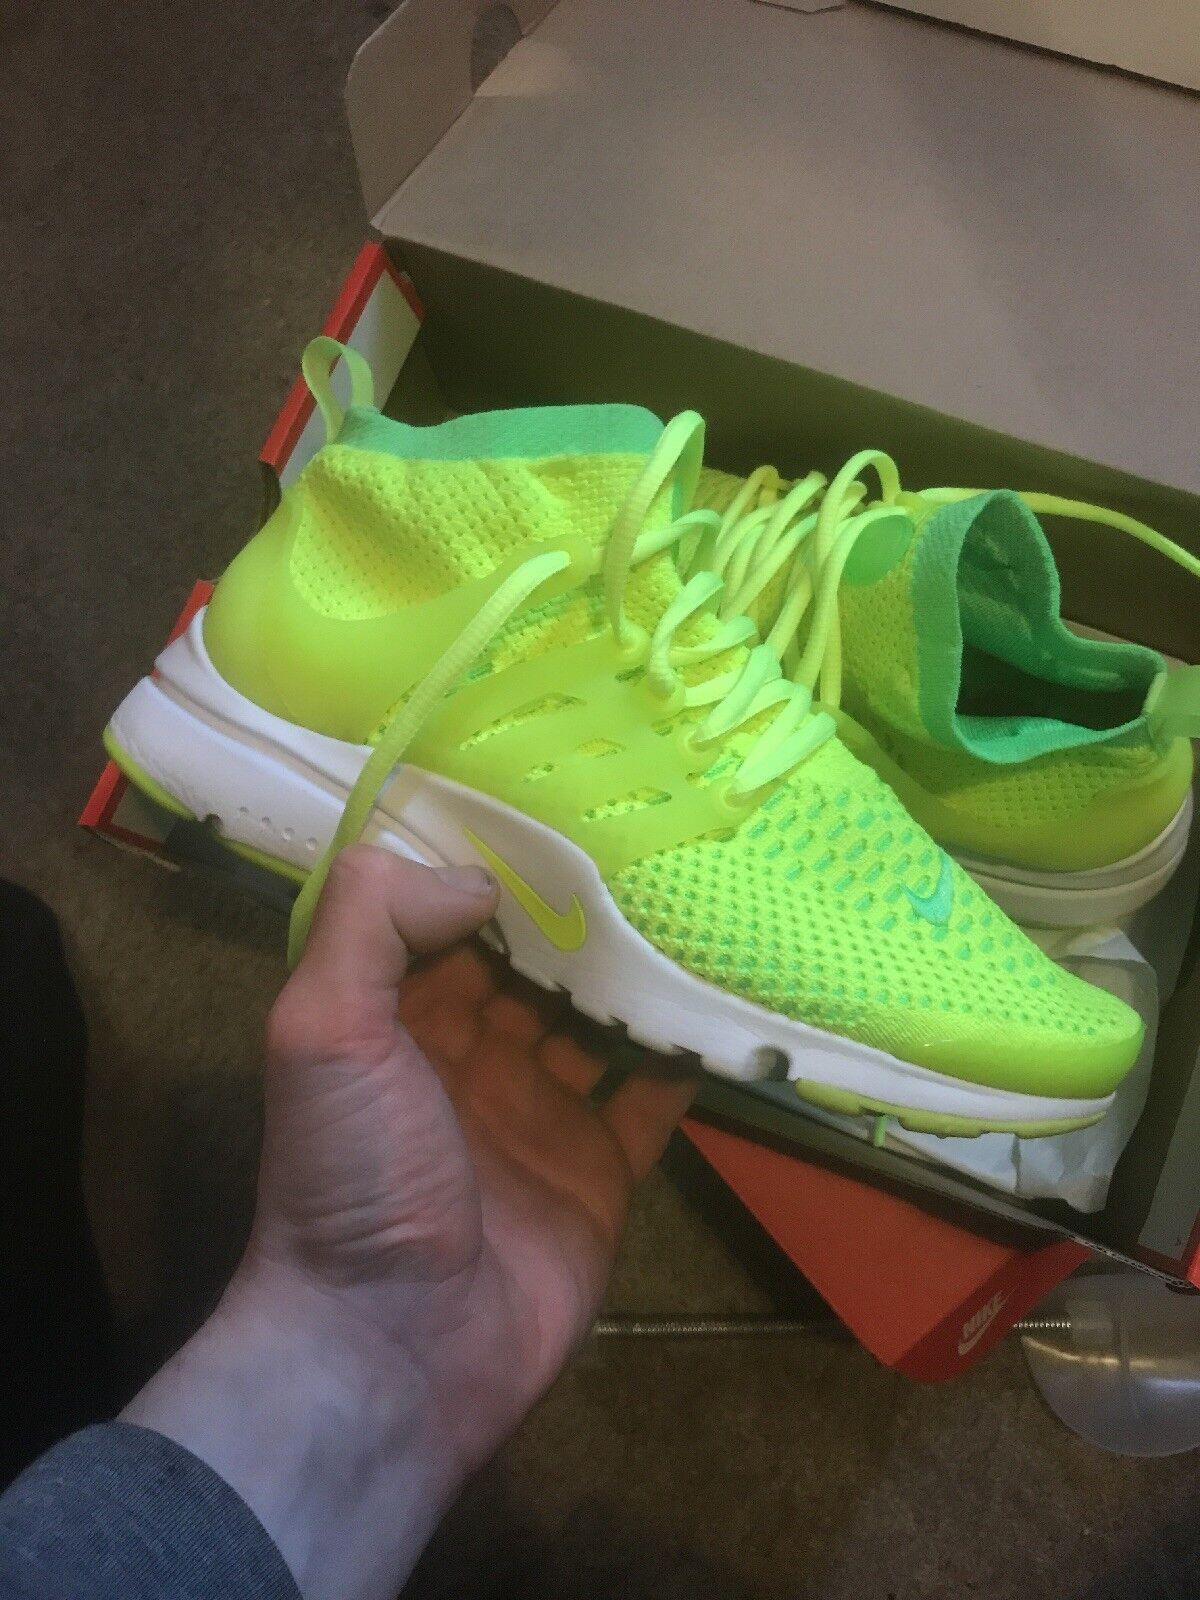 Nike Nike Nike Air Presto Flyknit Ultra Para Mujer Reino Unido 6 V Verde 684753